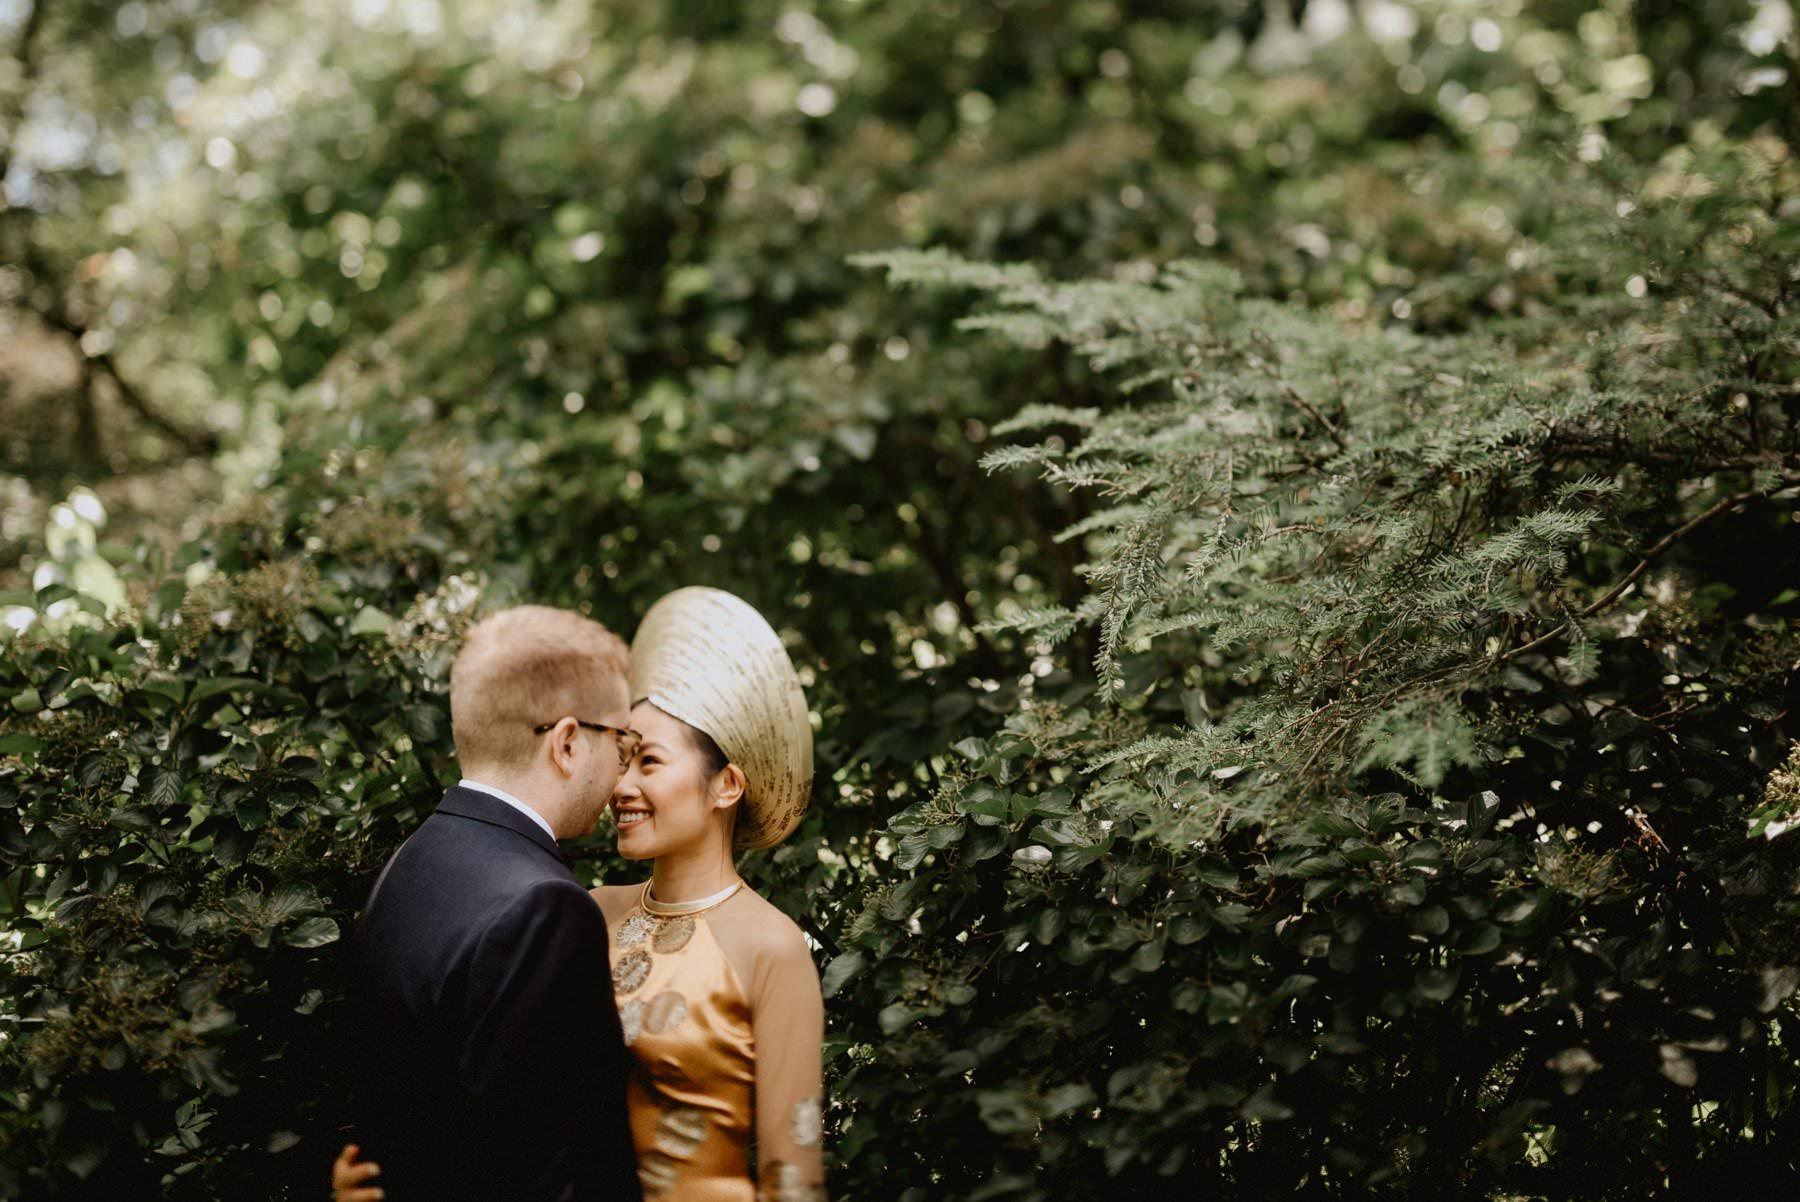 Appleford-estate-wedding-34.jpg